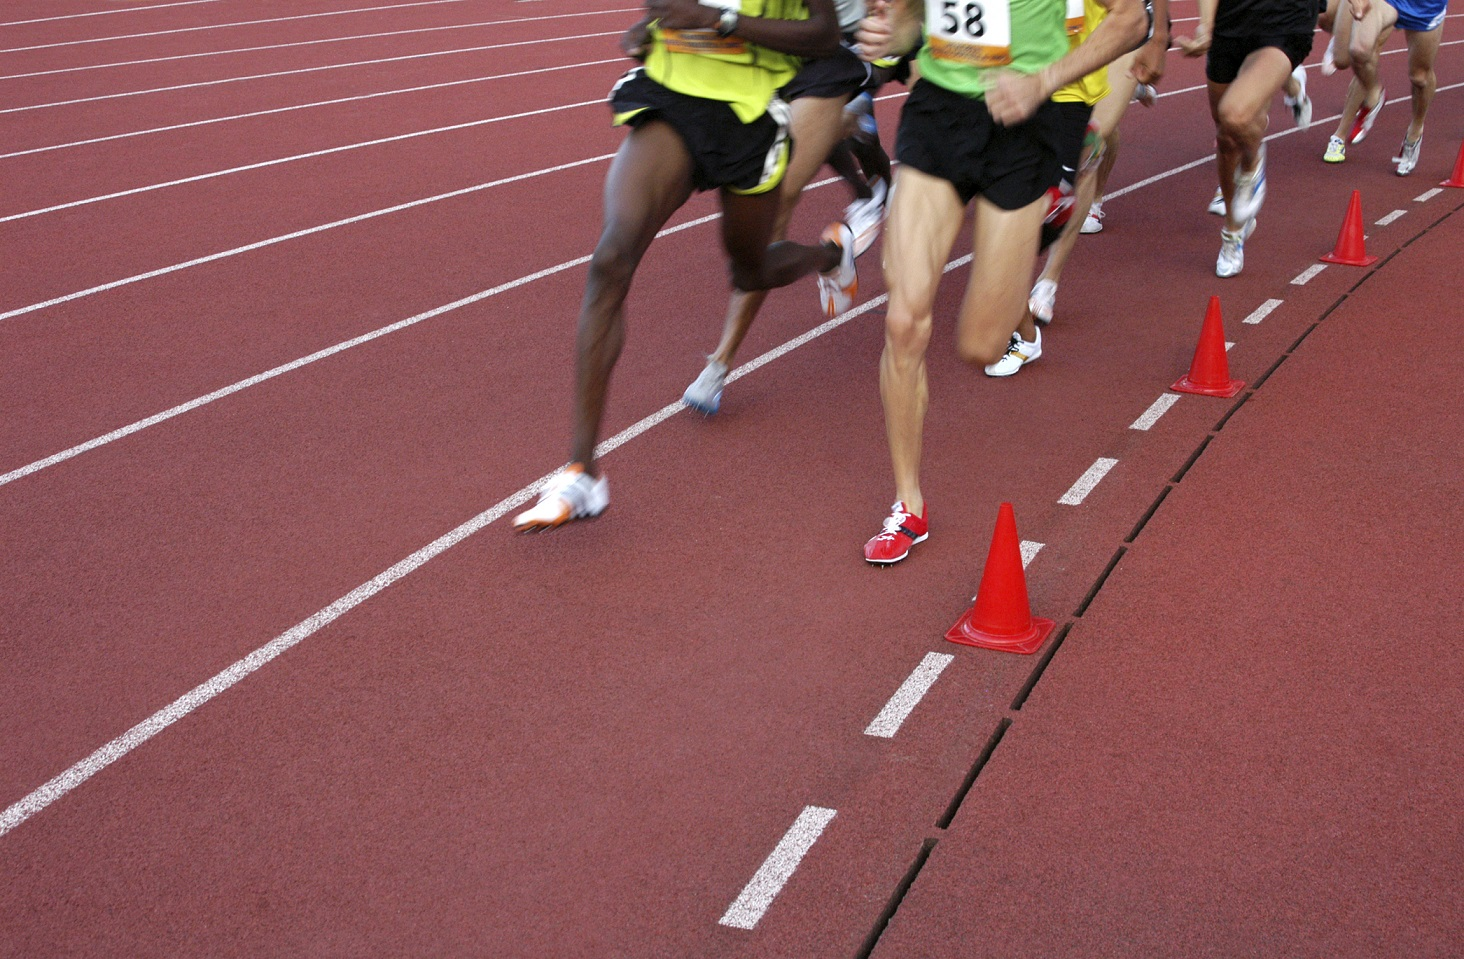 Running athletes at the stadium